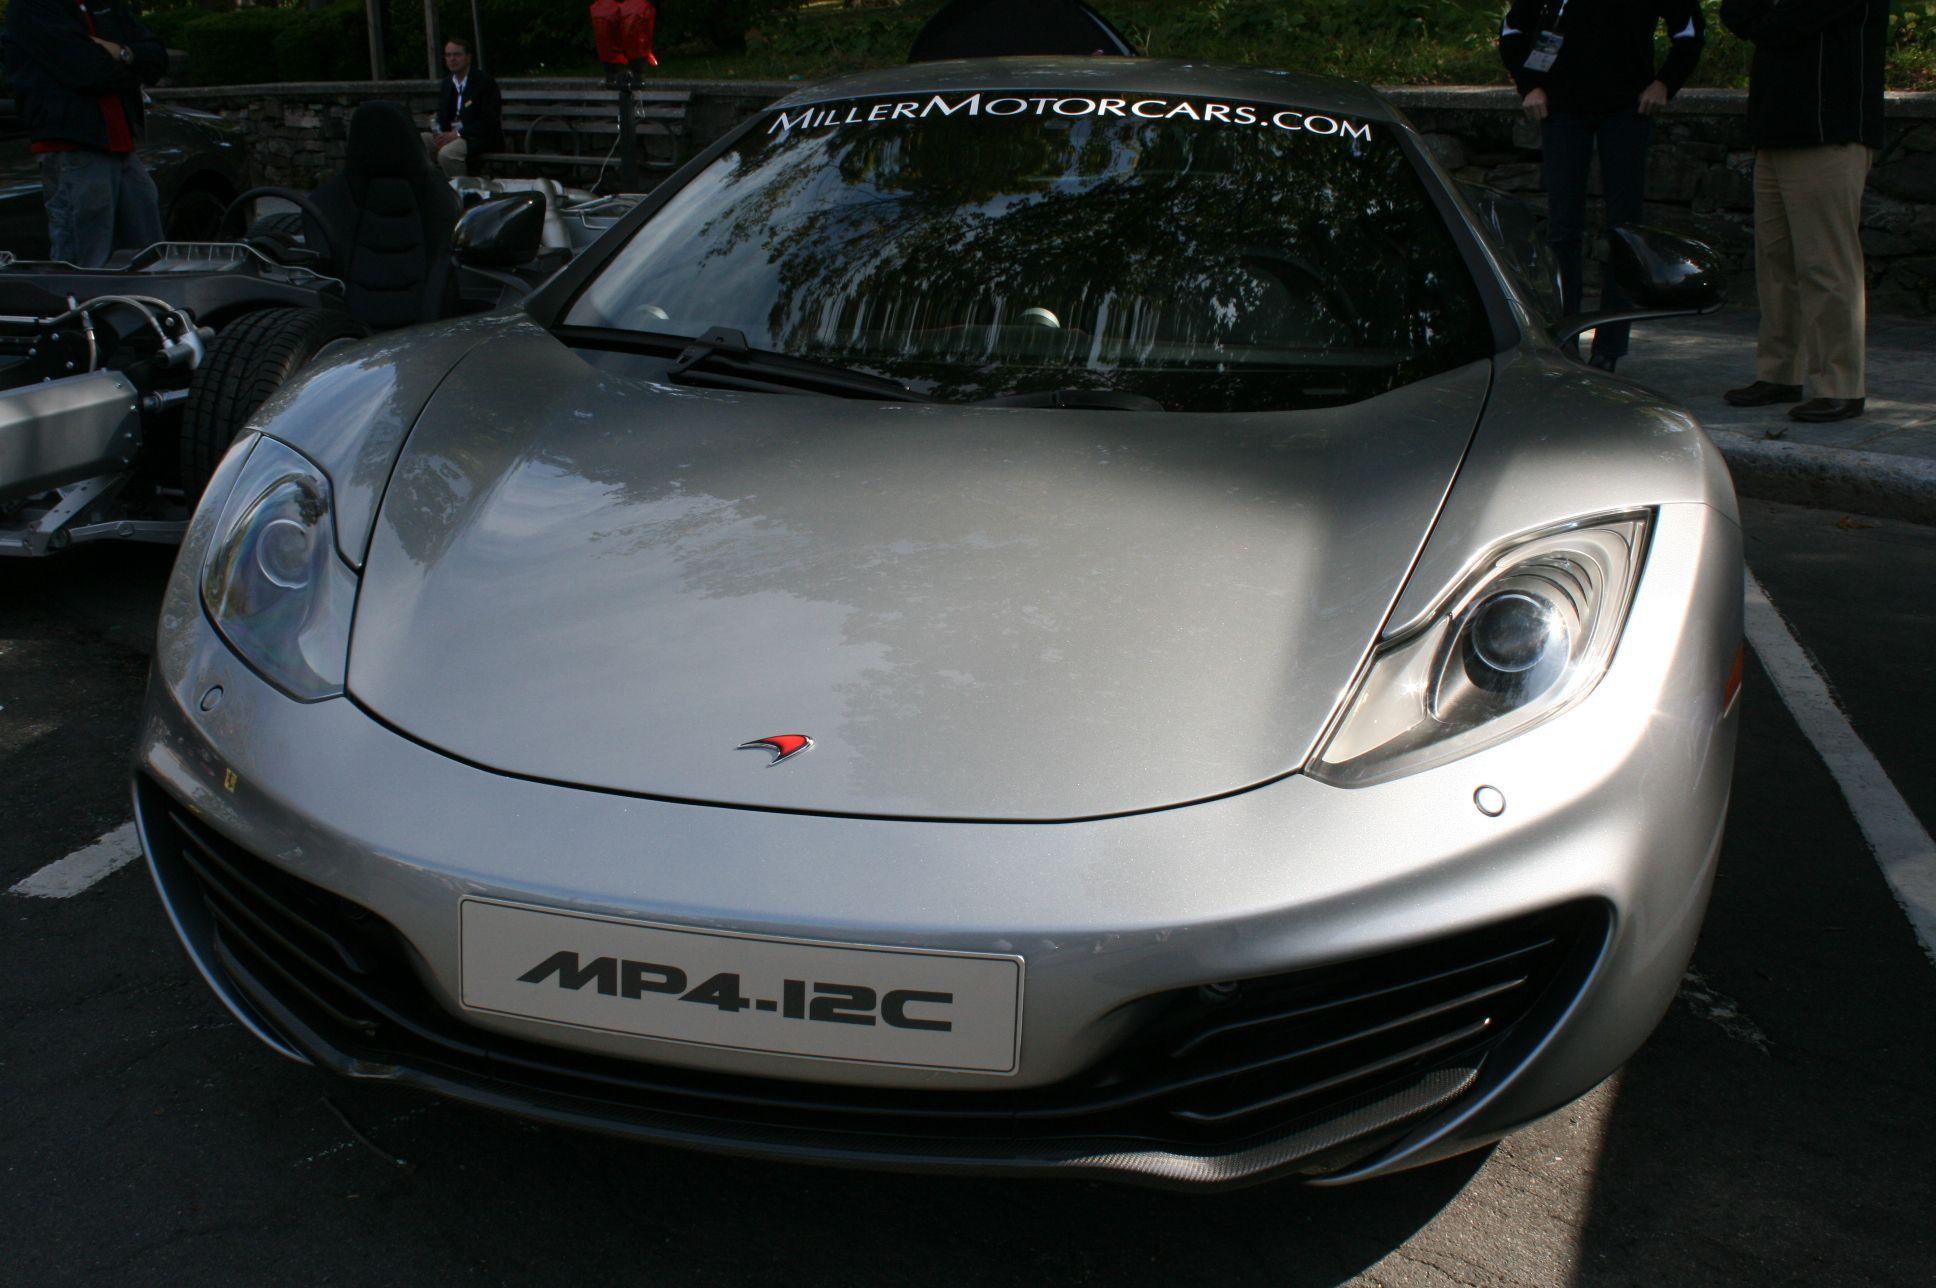 McLaren MP4-12C oh freakin yes